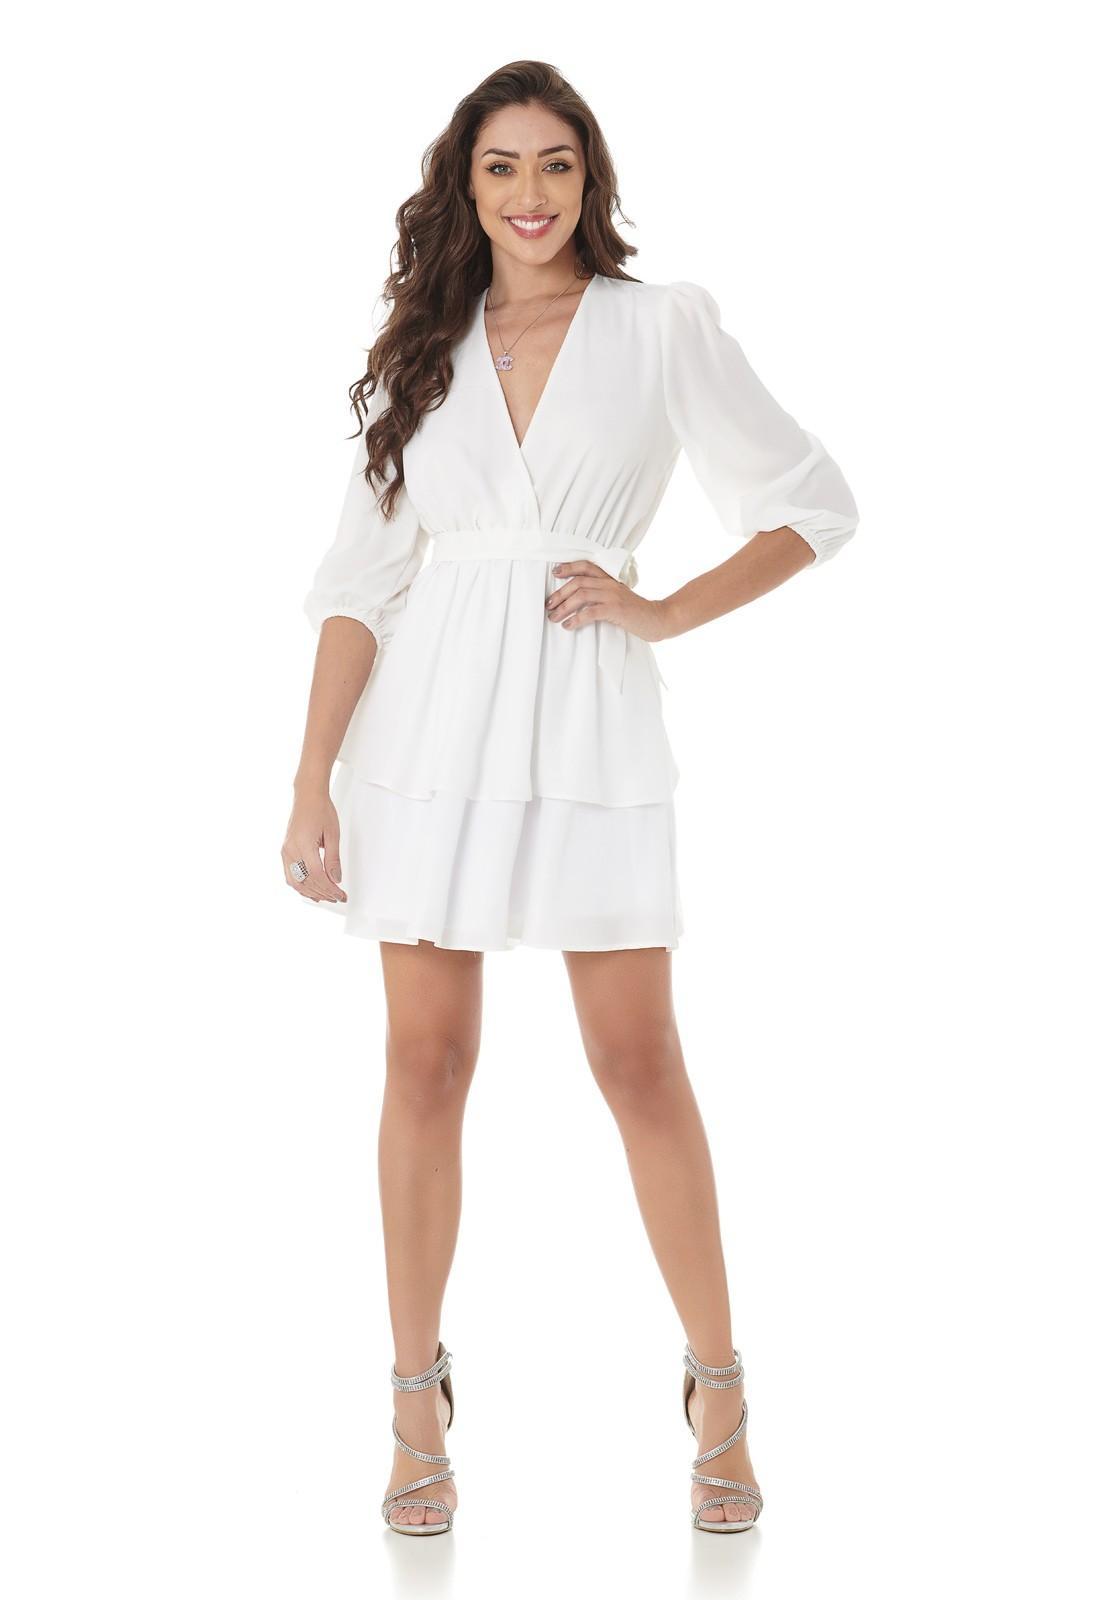 Vestido Curto Camadas Branco Lala Dubi